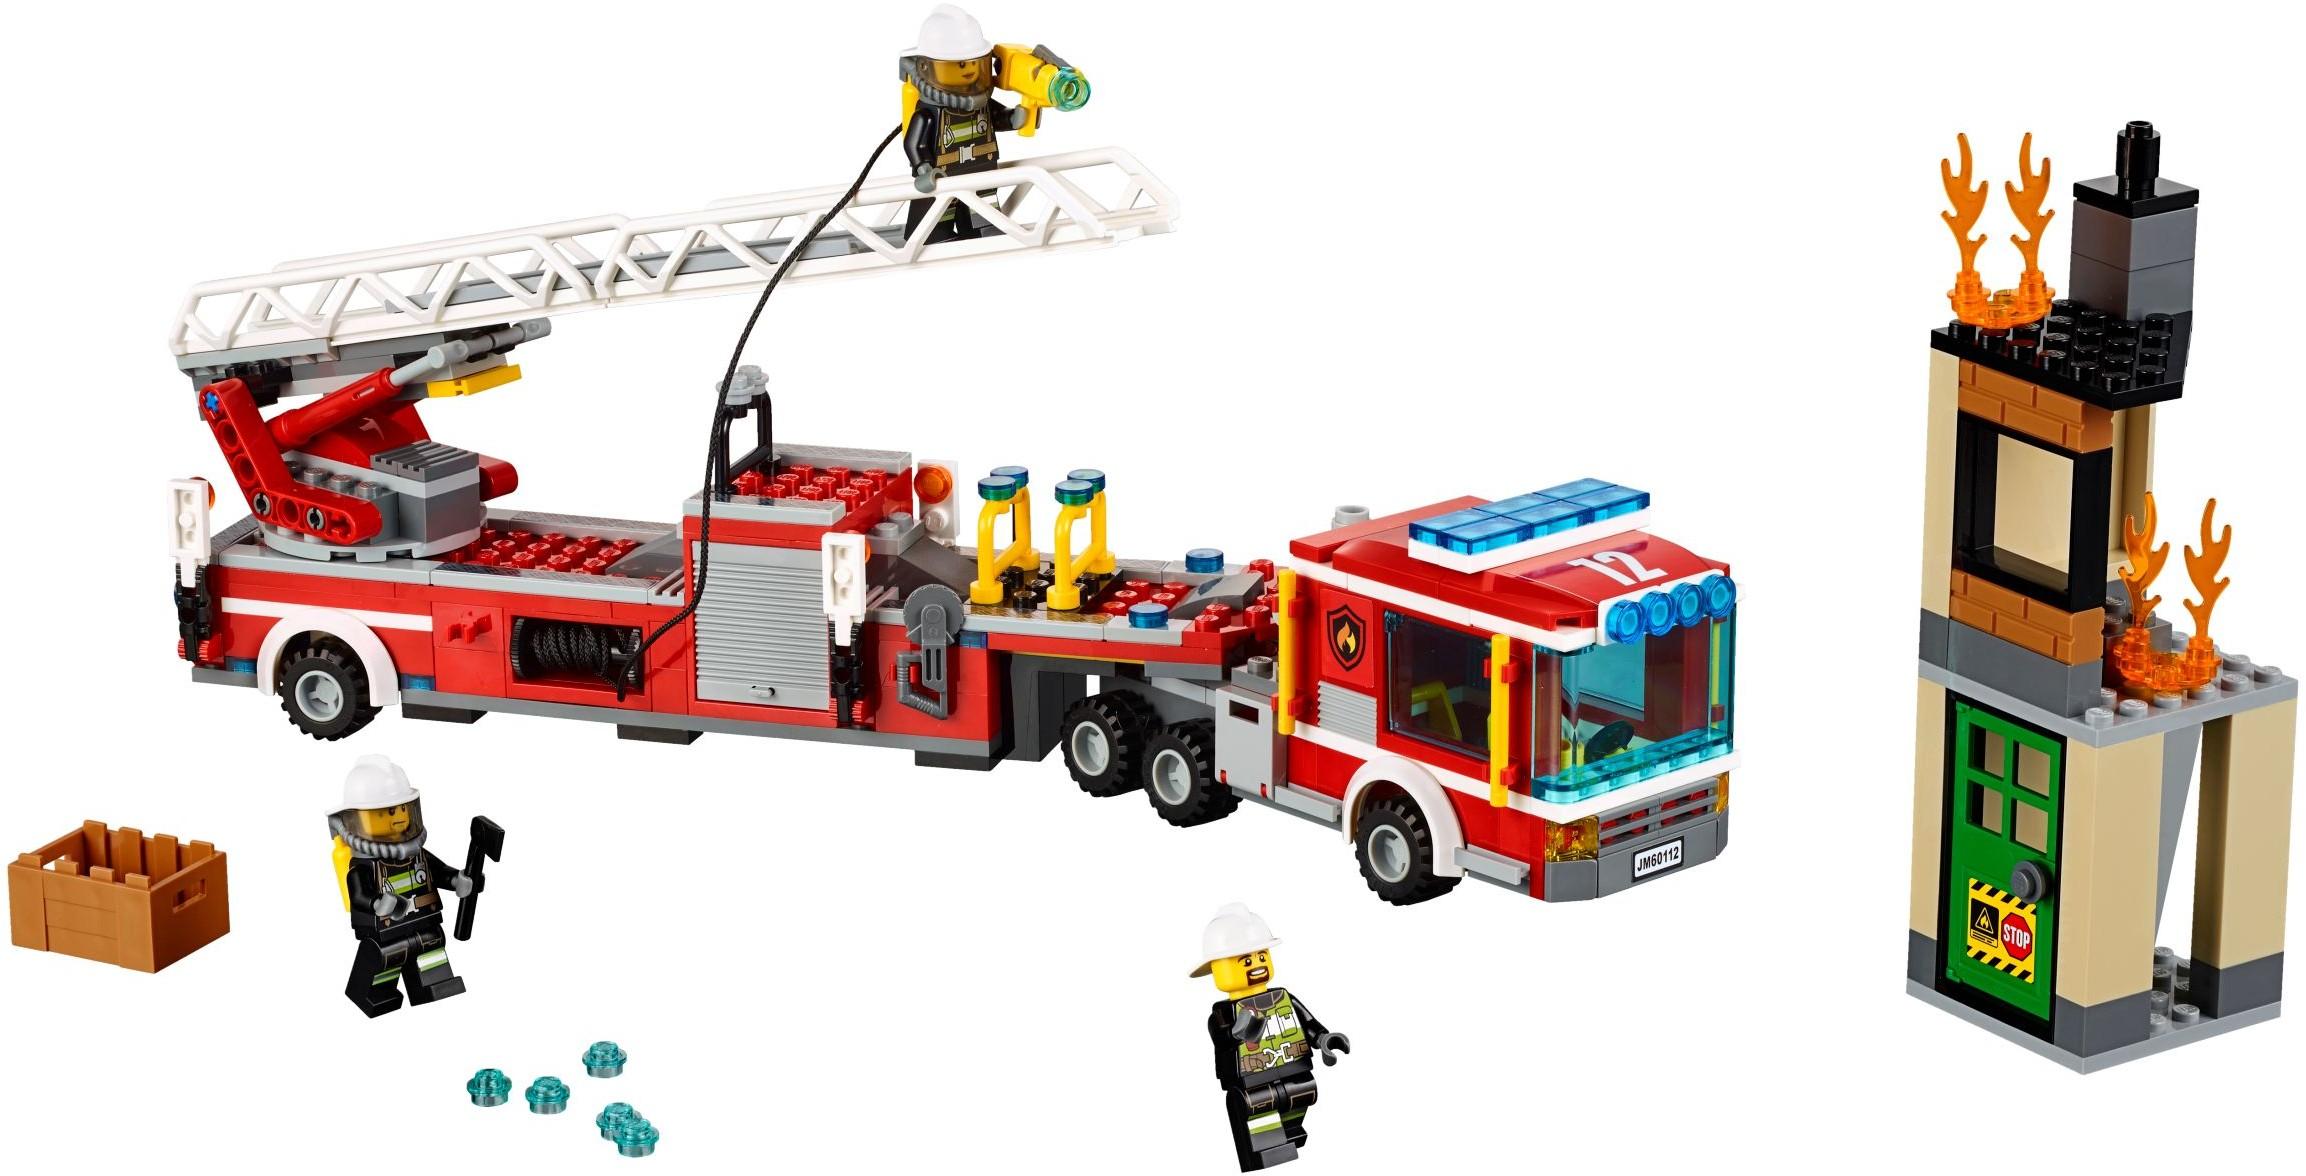 60112 LEGO City Fire Engine